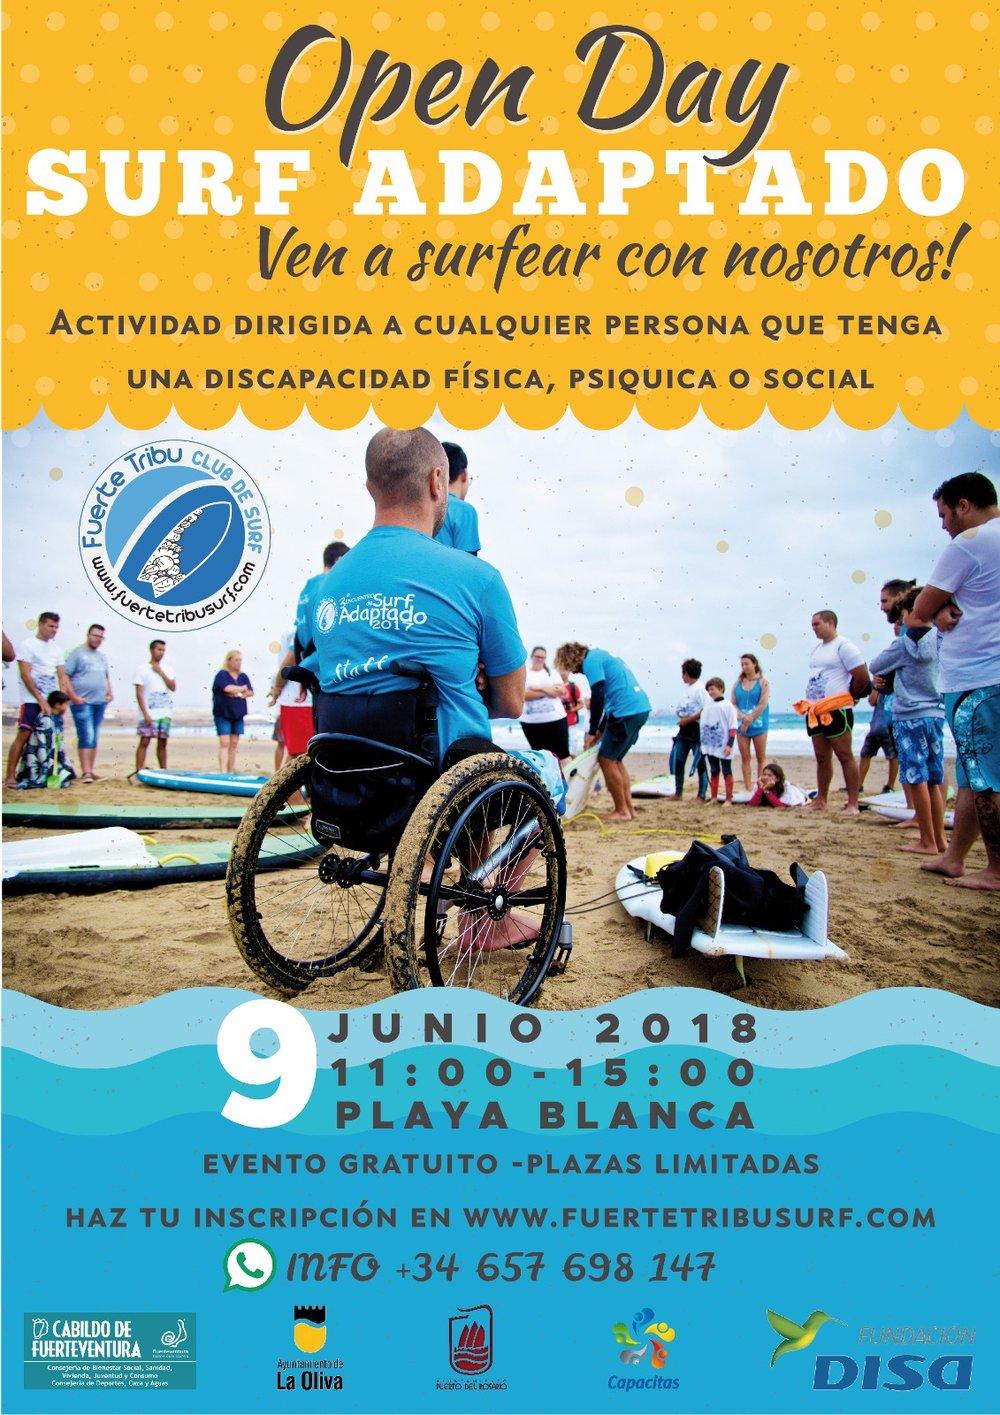 surf adaptado, adaptive surf, surf adattato, diversidad funcional, surf adaptado olimpico